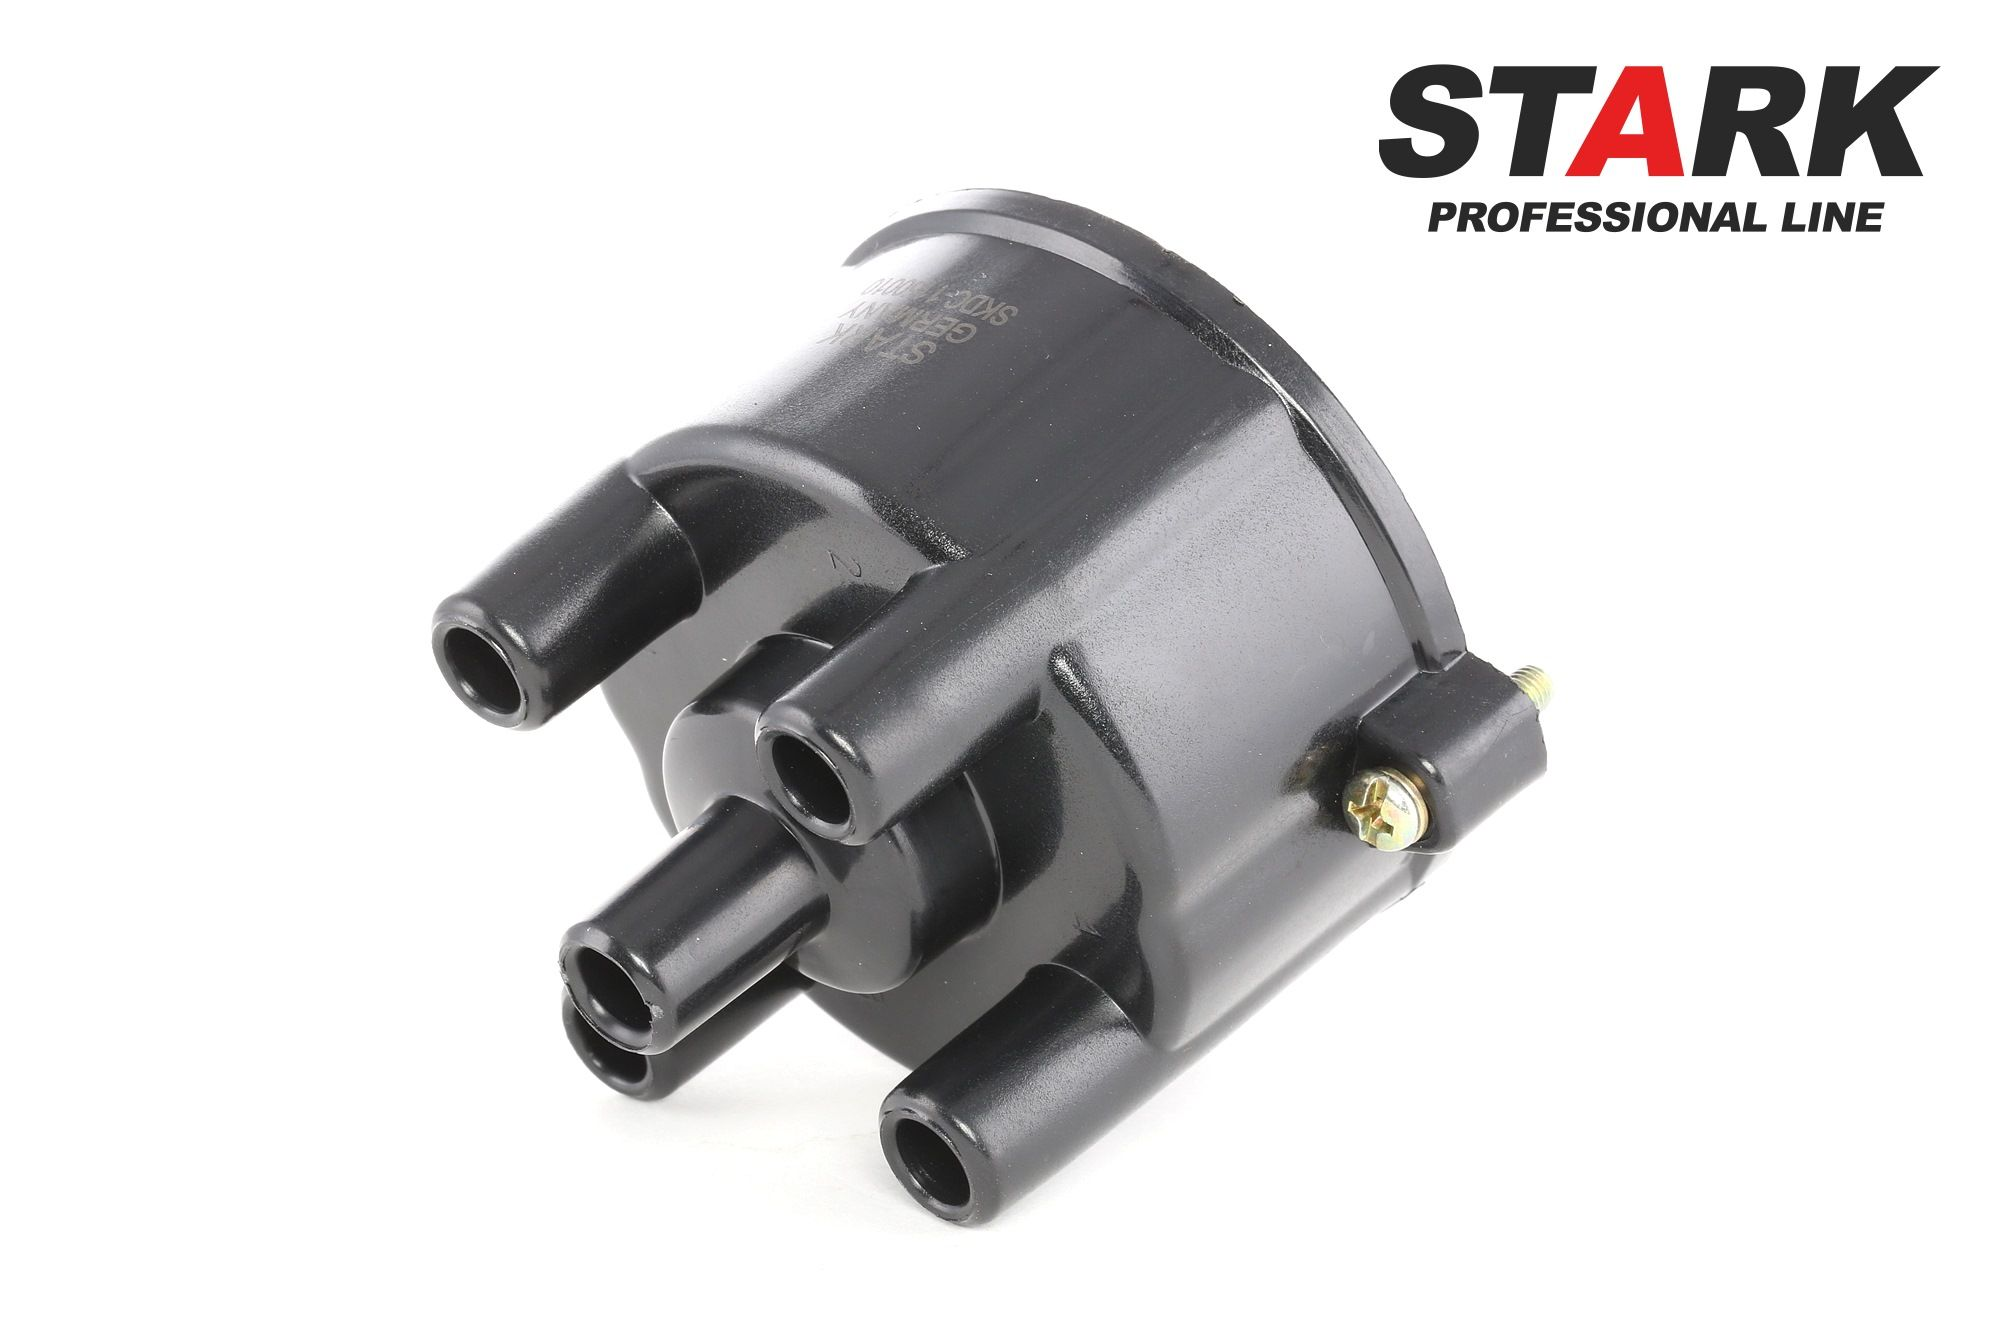 STARK: Original Zündverteilerkappe SKDC-1150010 (PP (Polypropylen))